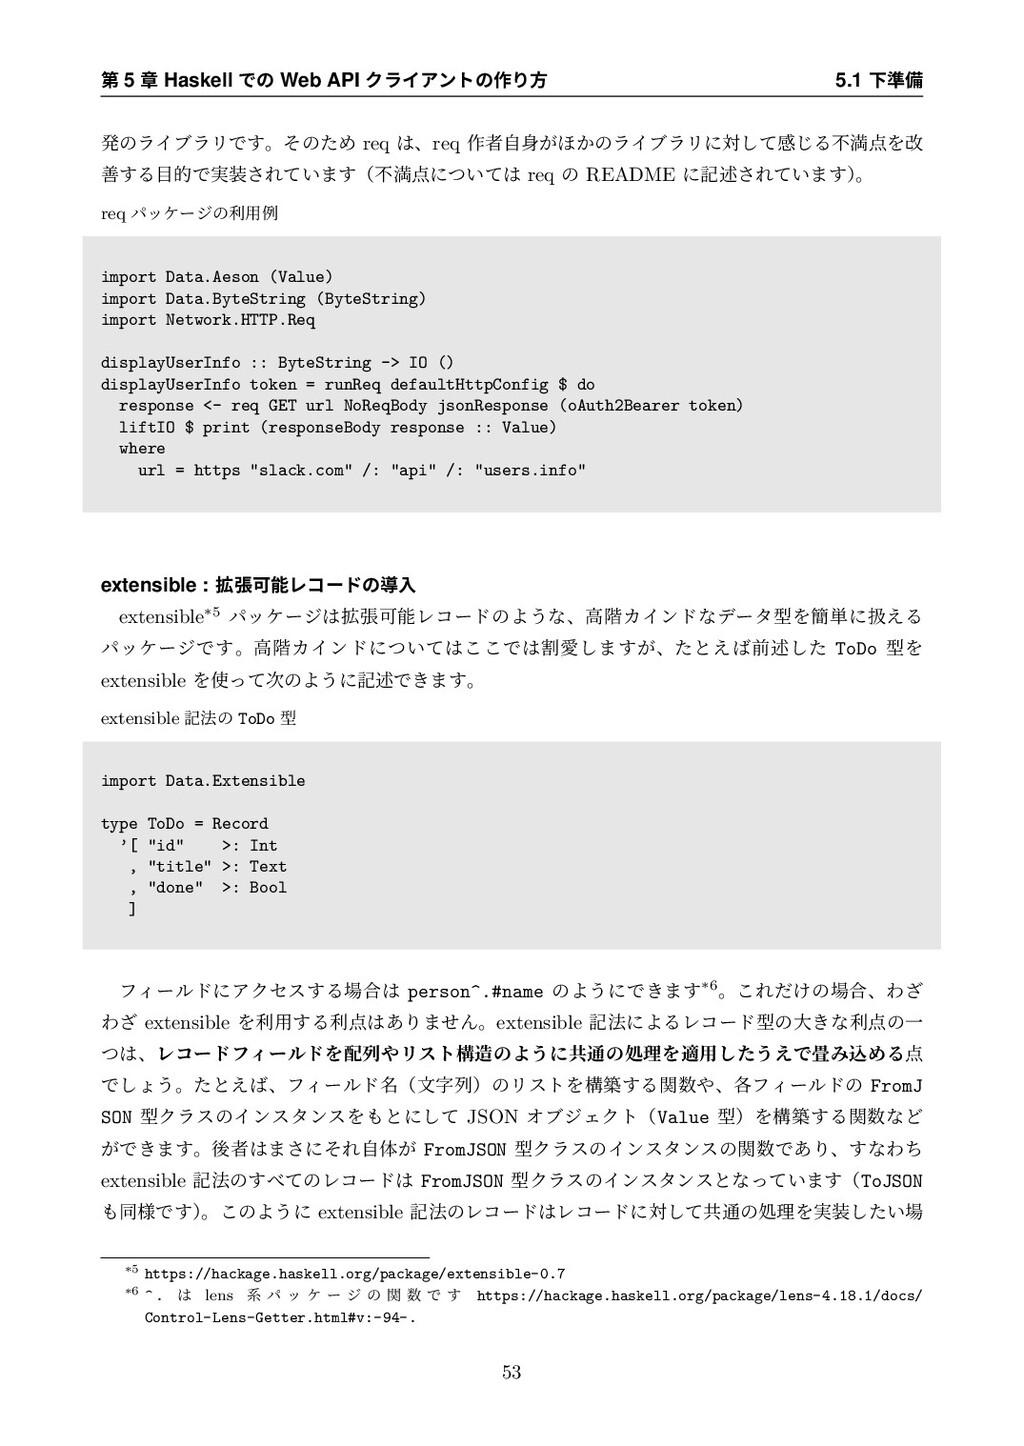 ୈ 5 ষ Haskell Ͱͷ Web API ΫϥΠΞϯτͷ࡞Γํ 5.1 Լ४උ ൃͷϥ...